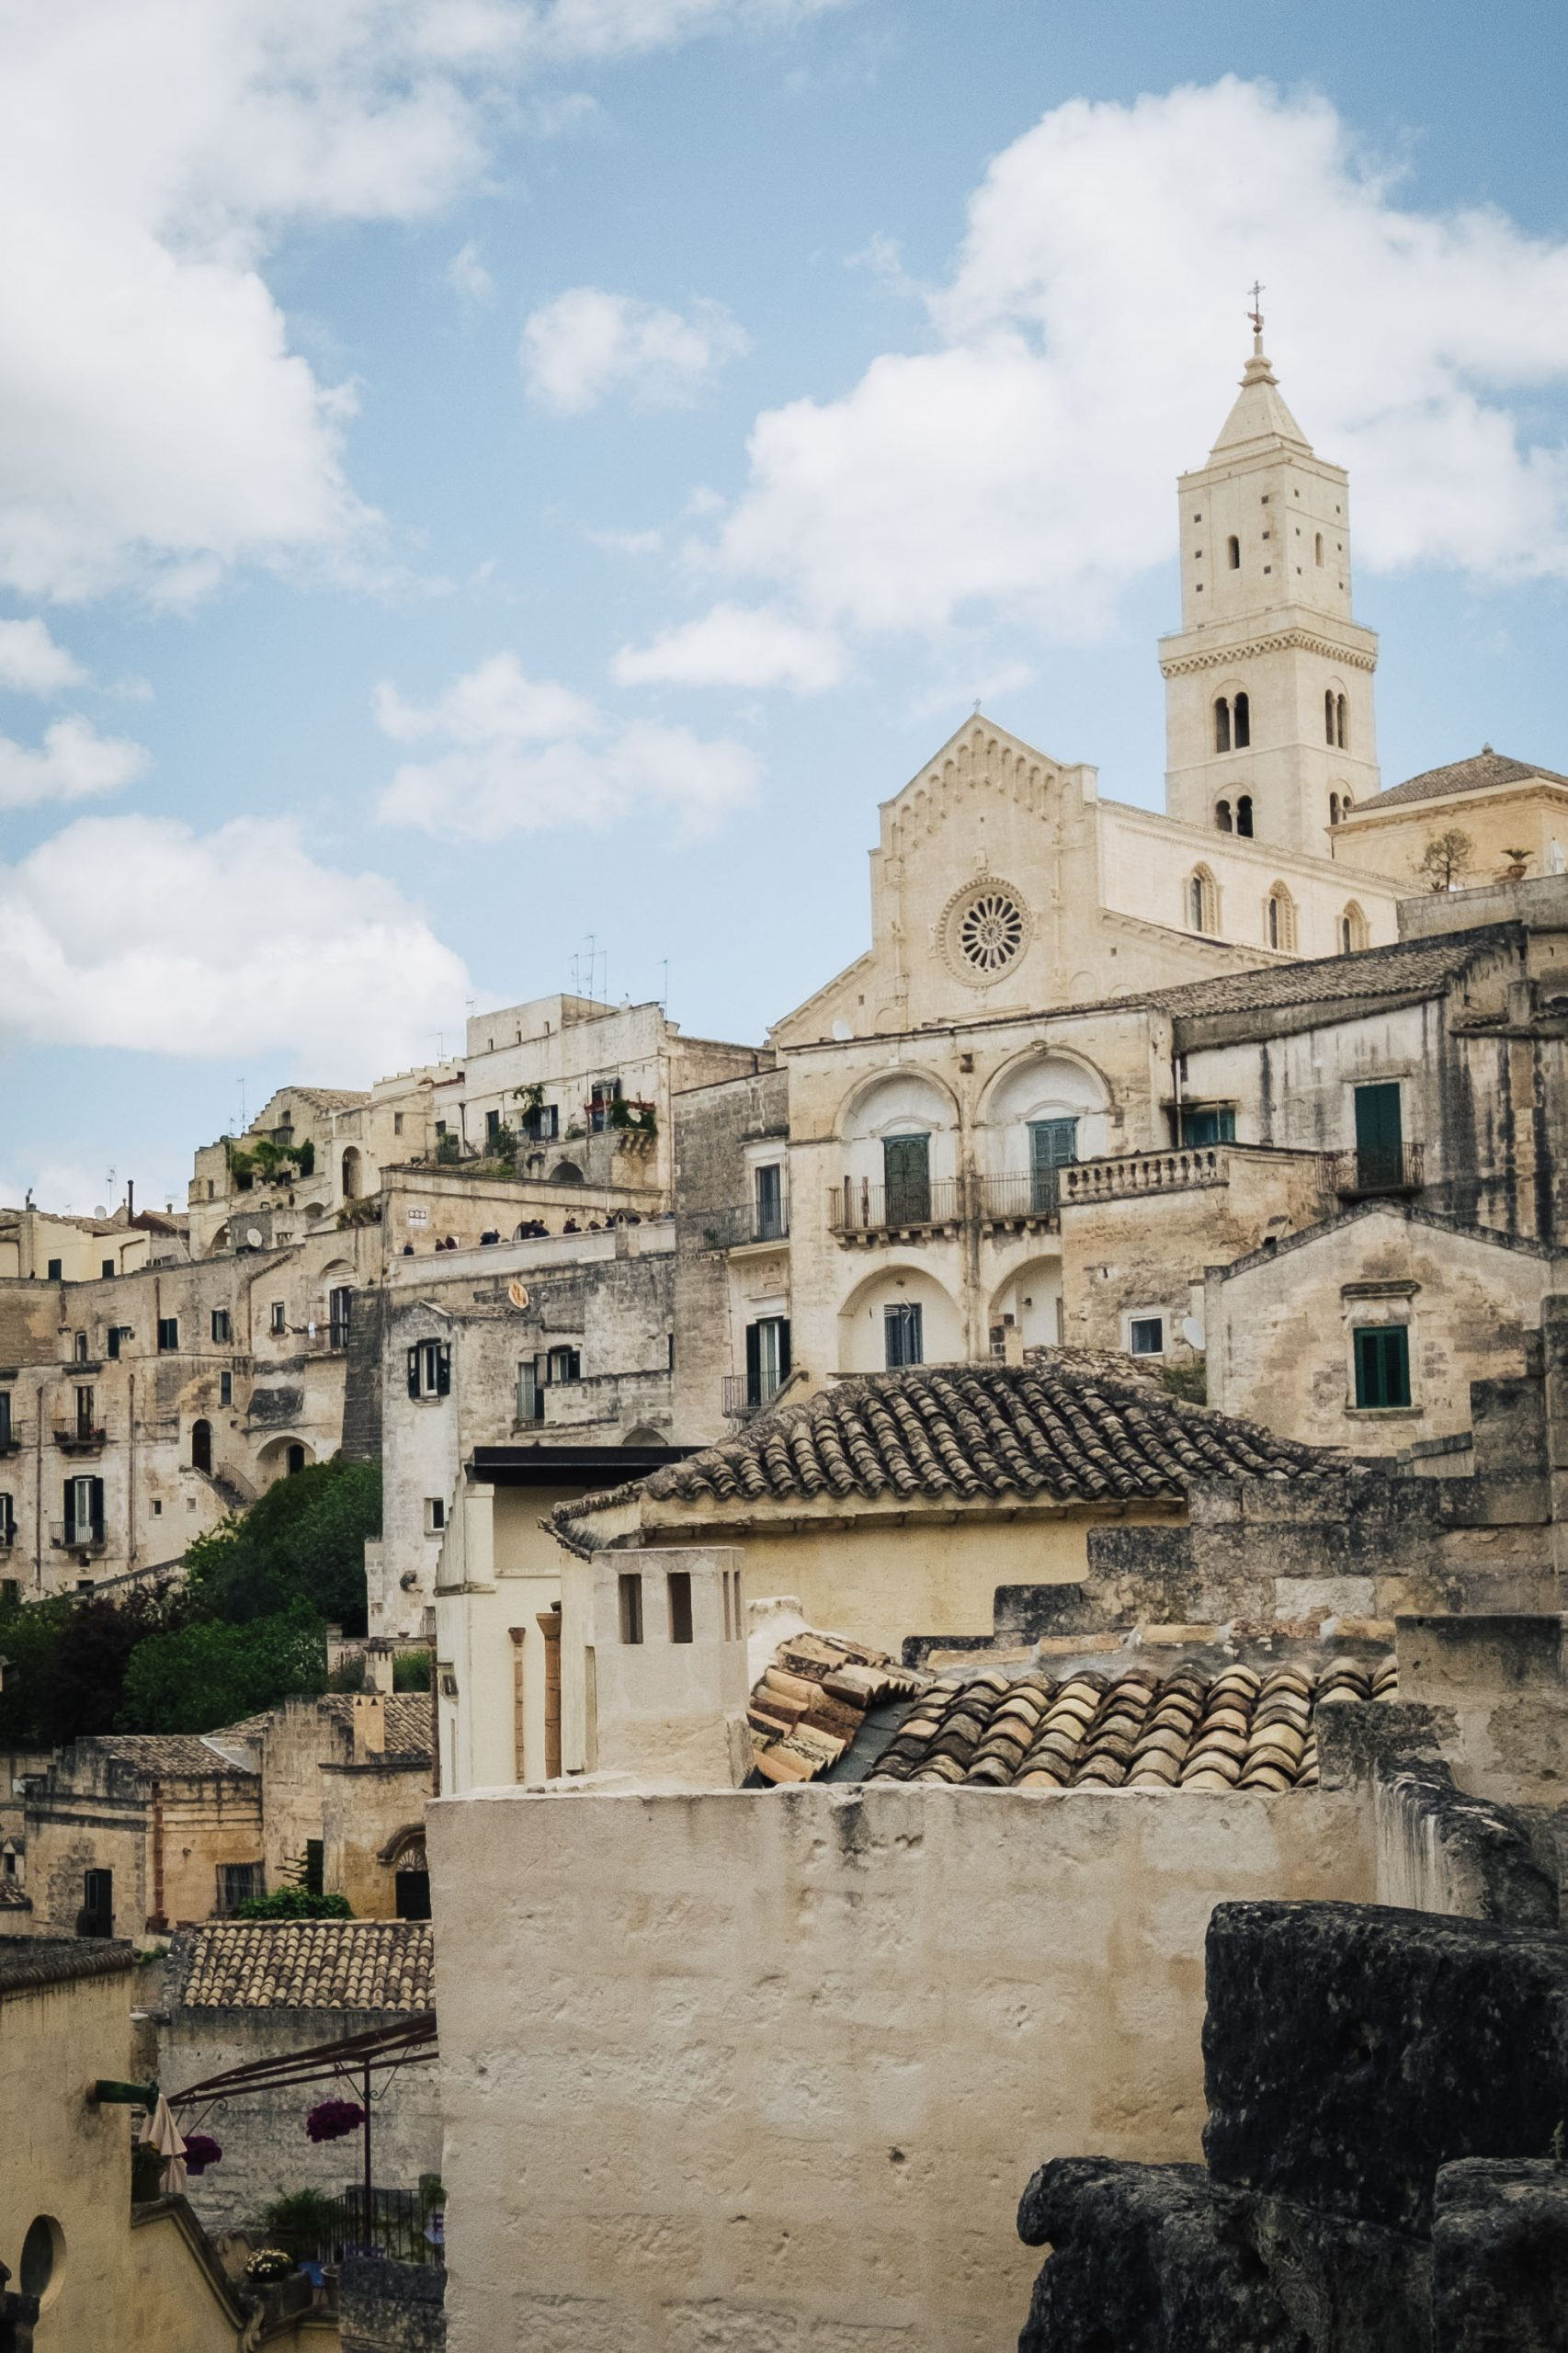 Sassi di Matera | Why Matera Should Be On Everyone's Bucket List | Mondomulia